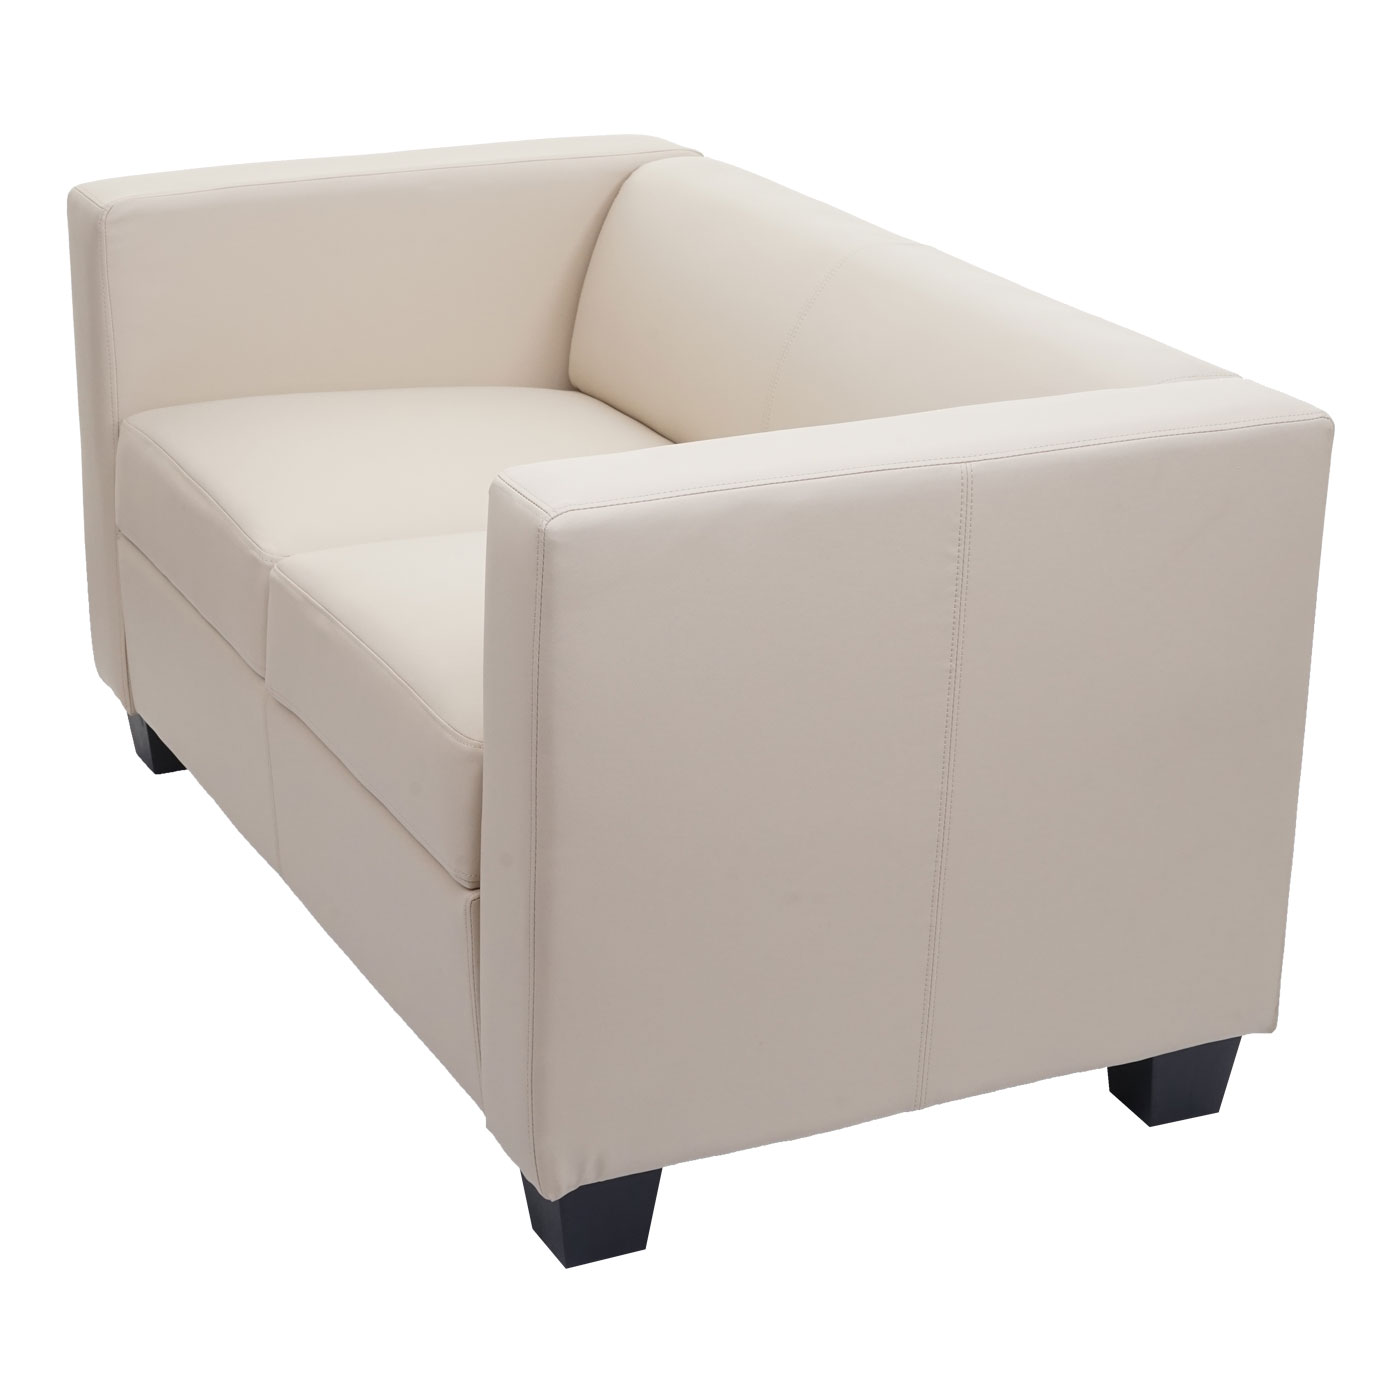 2er Sofa Couch Loungesofa Lille Seitenansicht